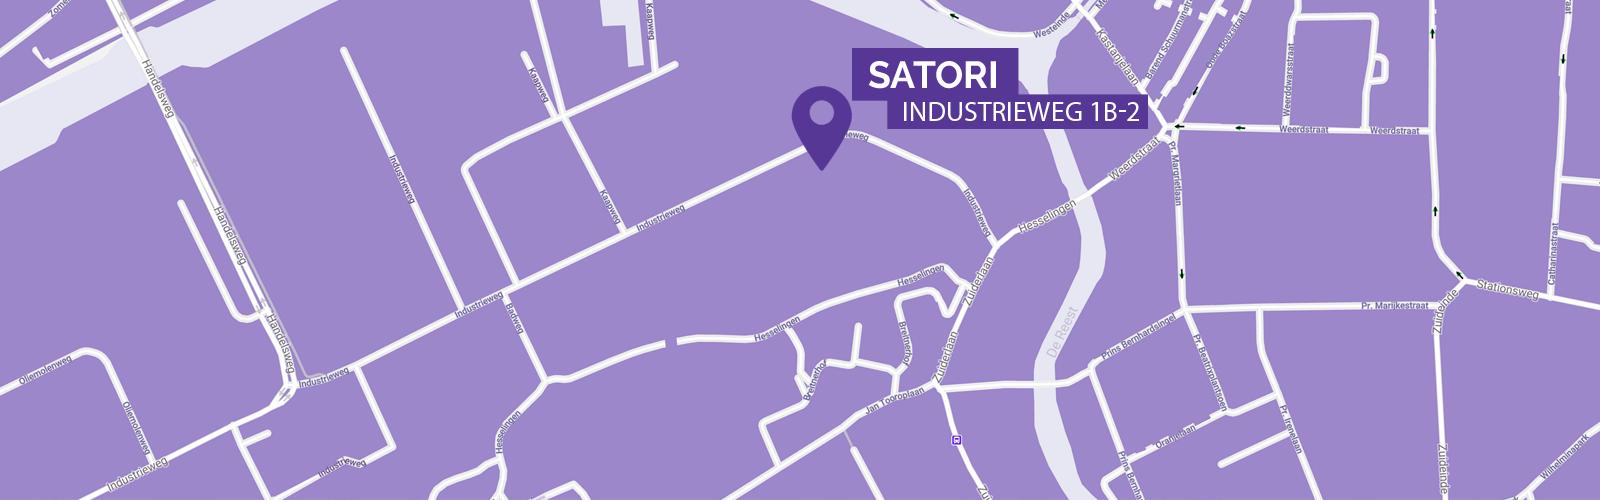 Adres van Satori - Burgemeester van Roijensingel 6 in Zwolle